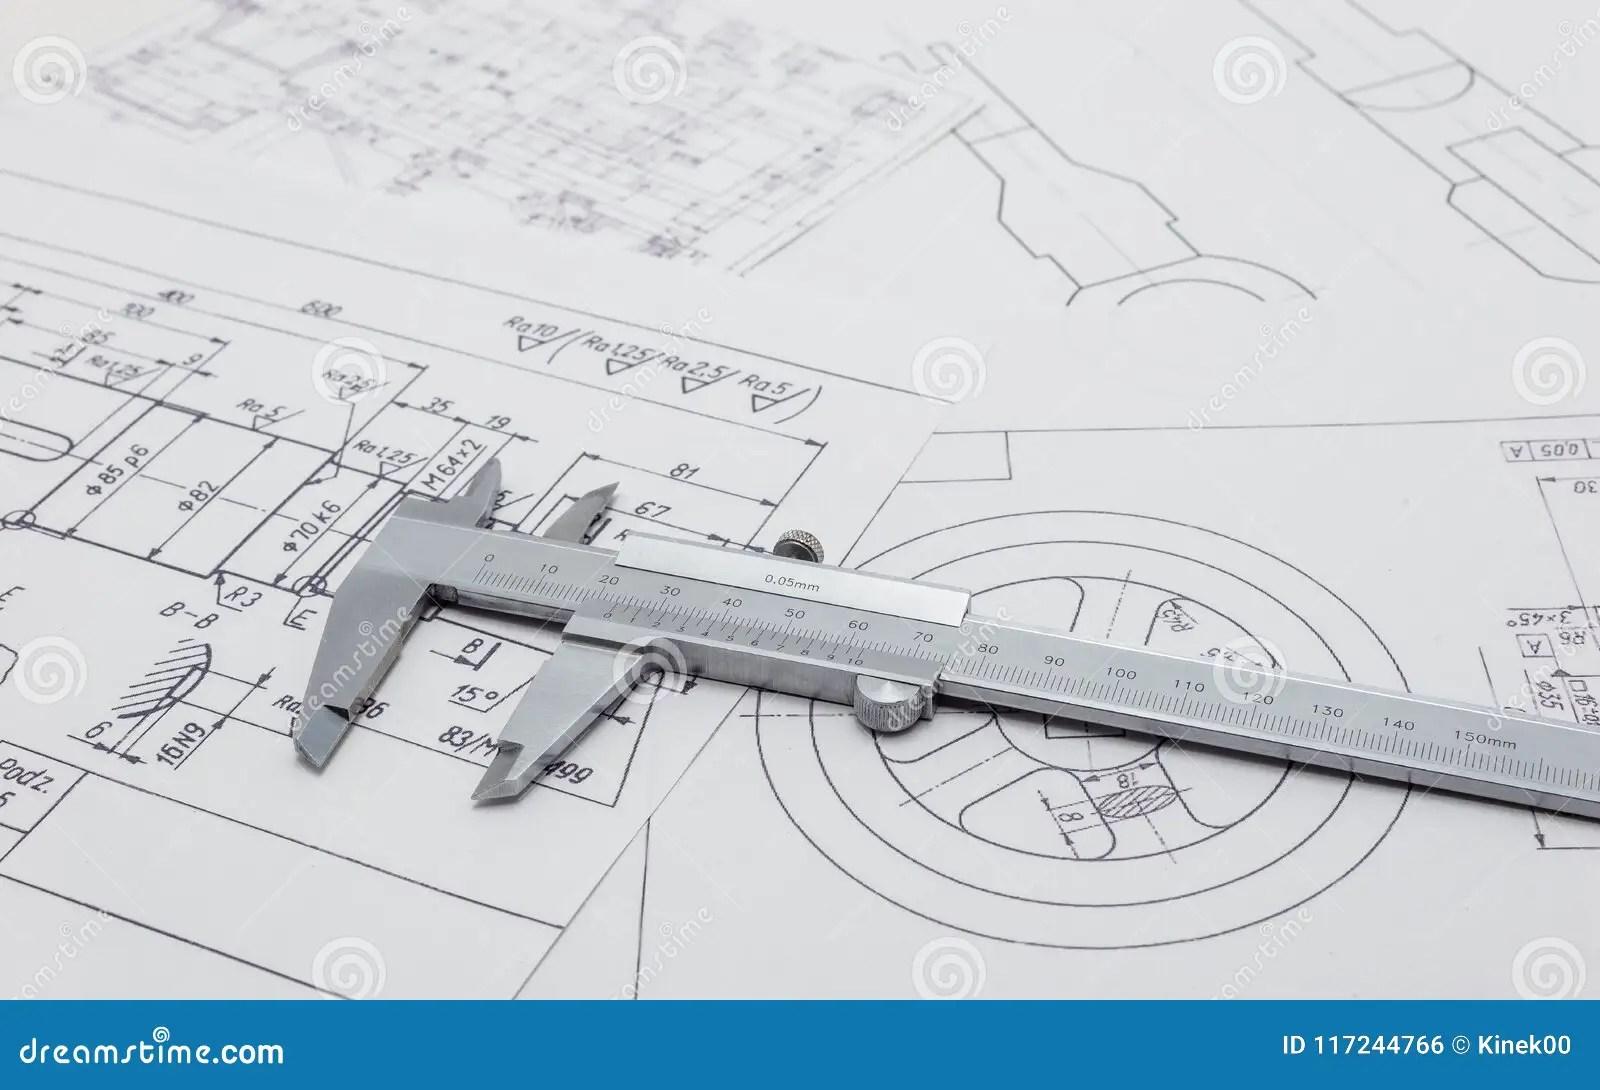 hight resolution of vernier caliper lying on mechanical scheme